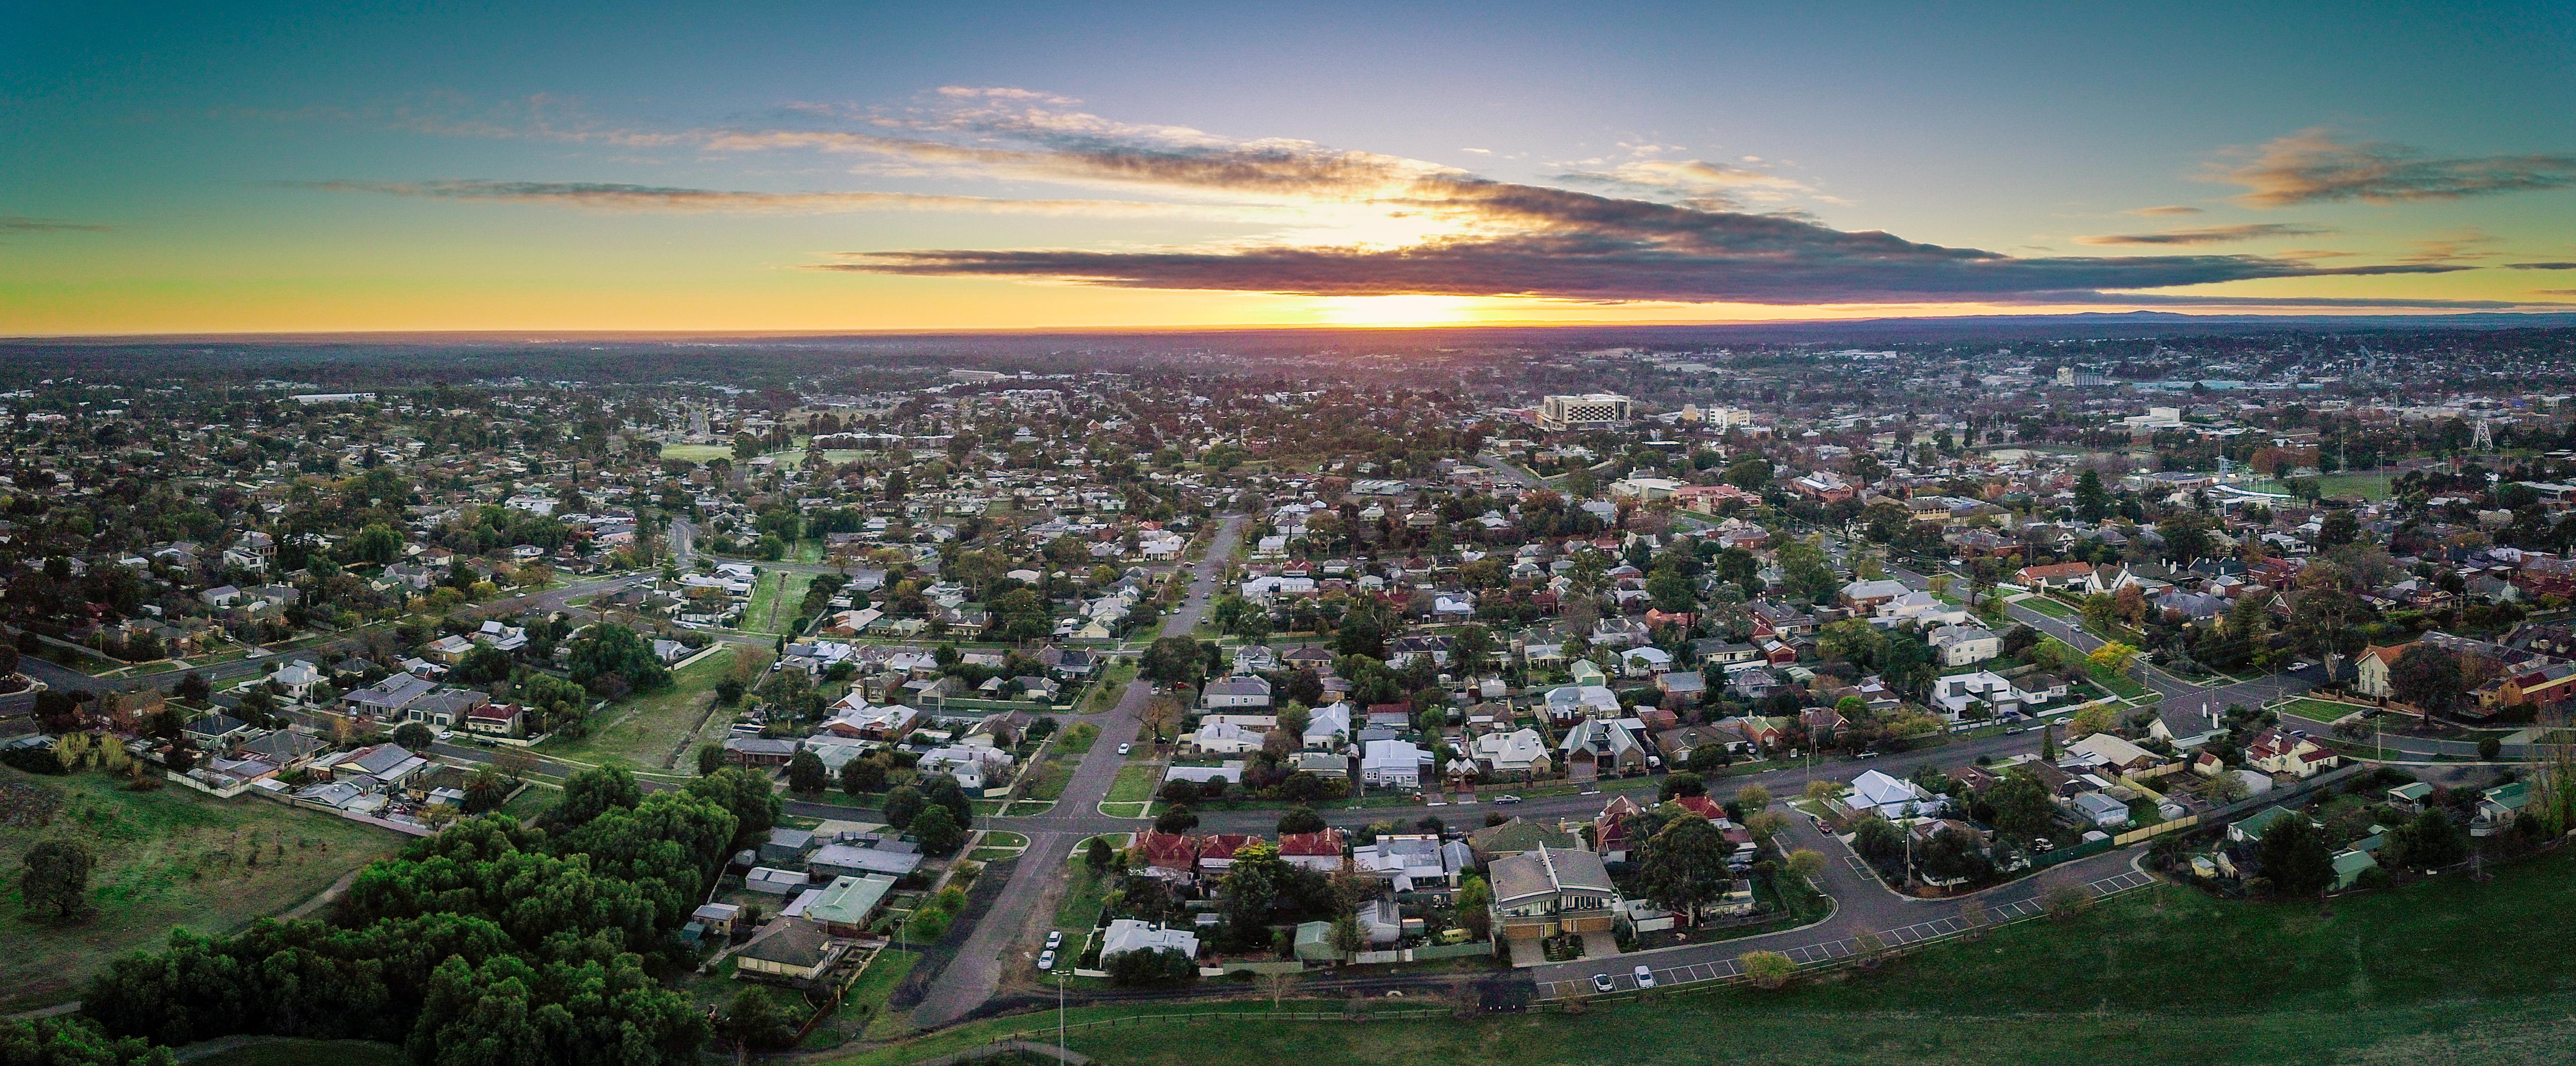 Sunrise Over Bendigo